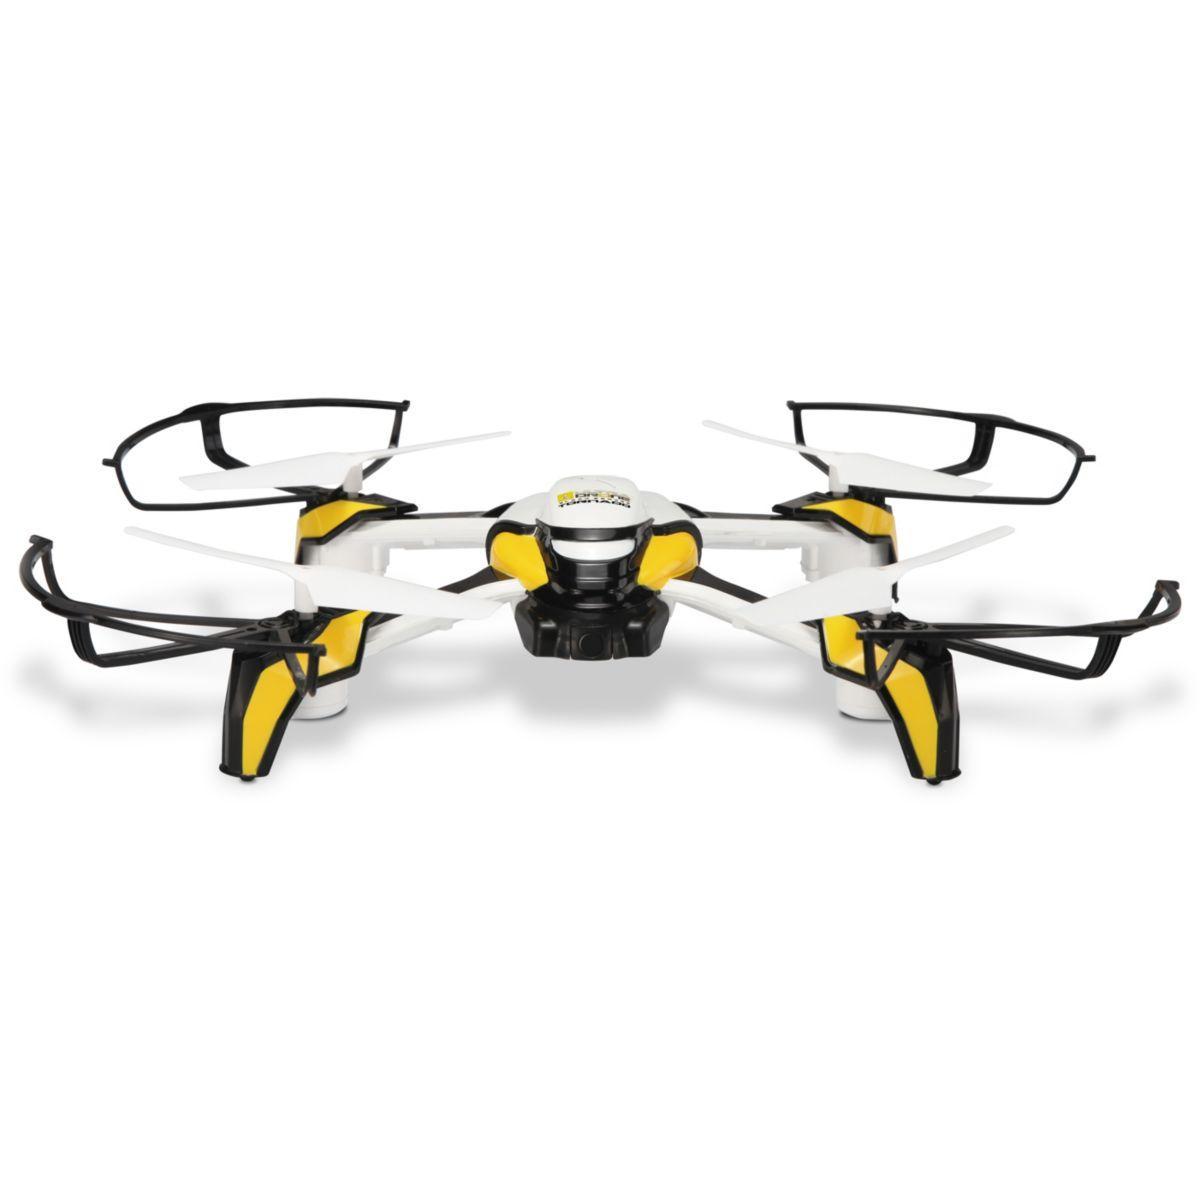 Drone mondo motors ultradrone tornado r/c - 5% de remise immédiate avec le code : fete5 (photo)